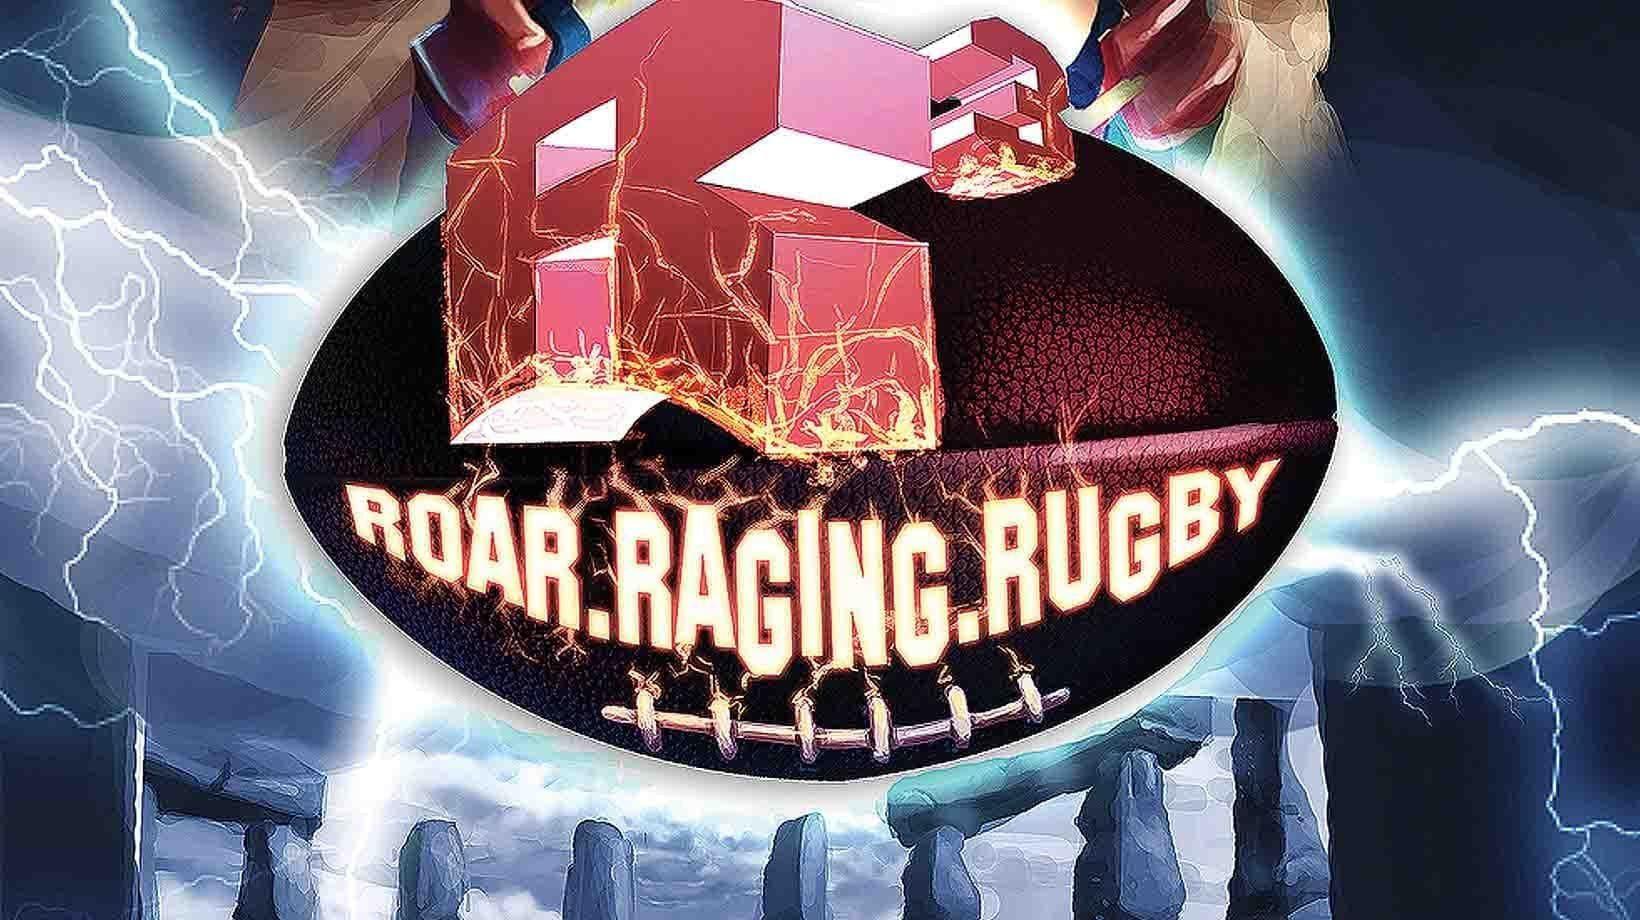 r3-roar-raging-rugby